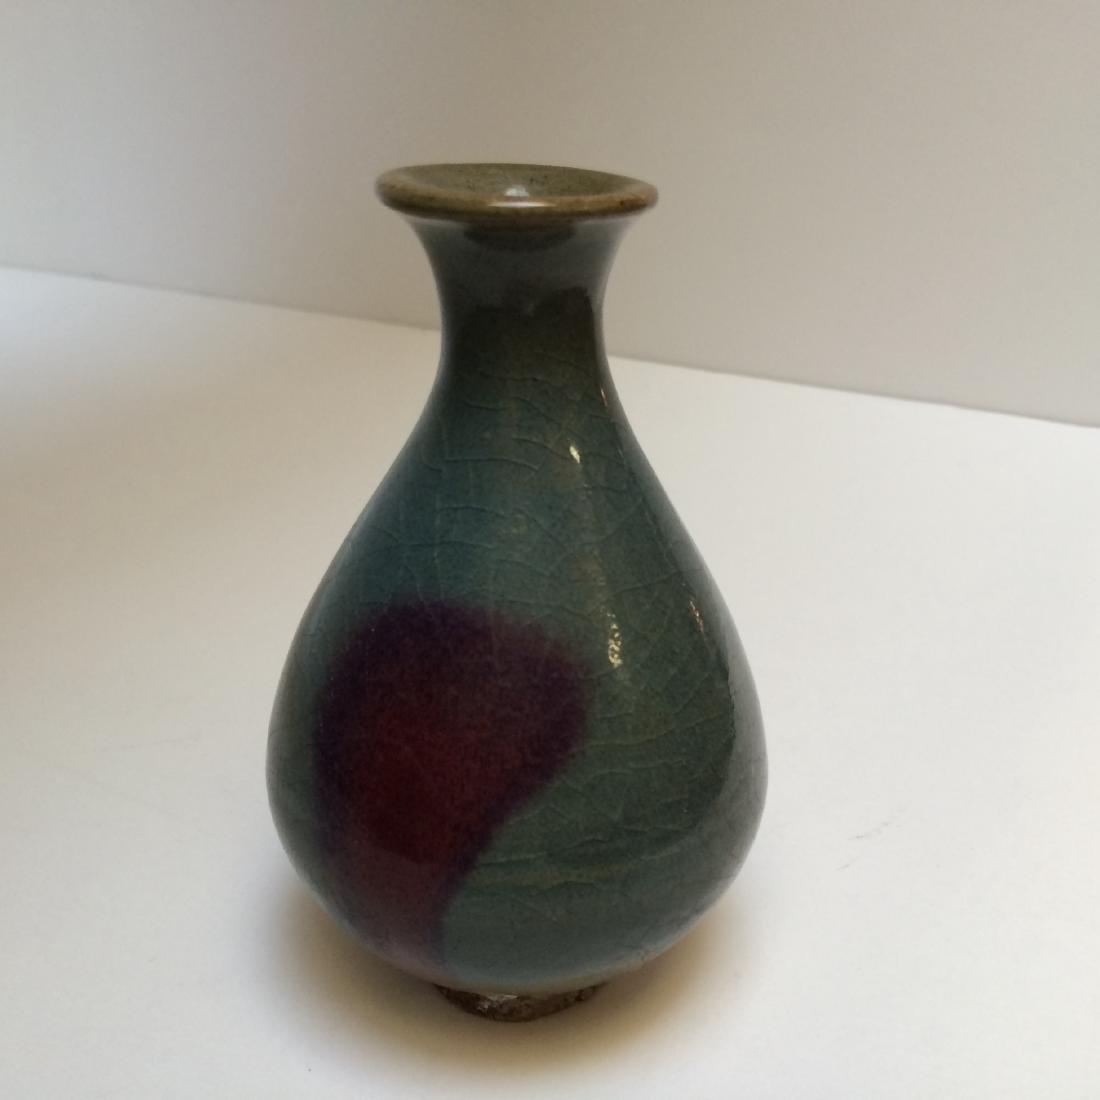 Chinese Yuan Dynasty Style Jun Ware Vase